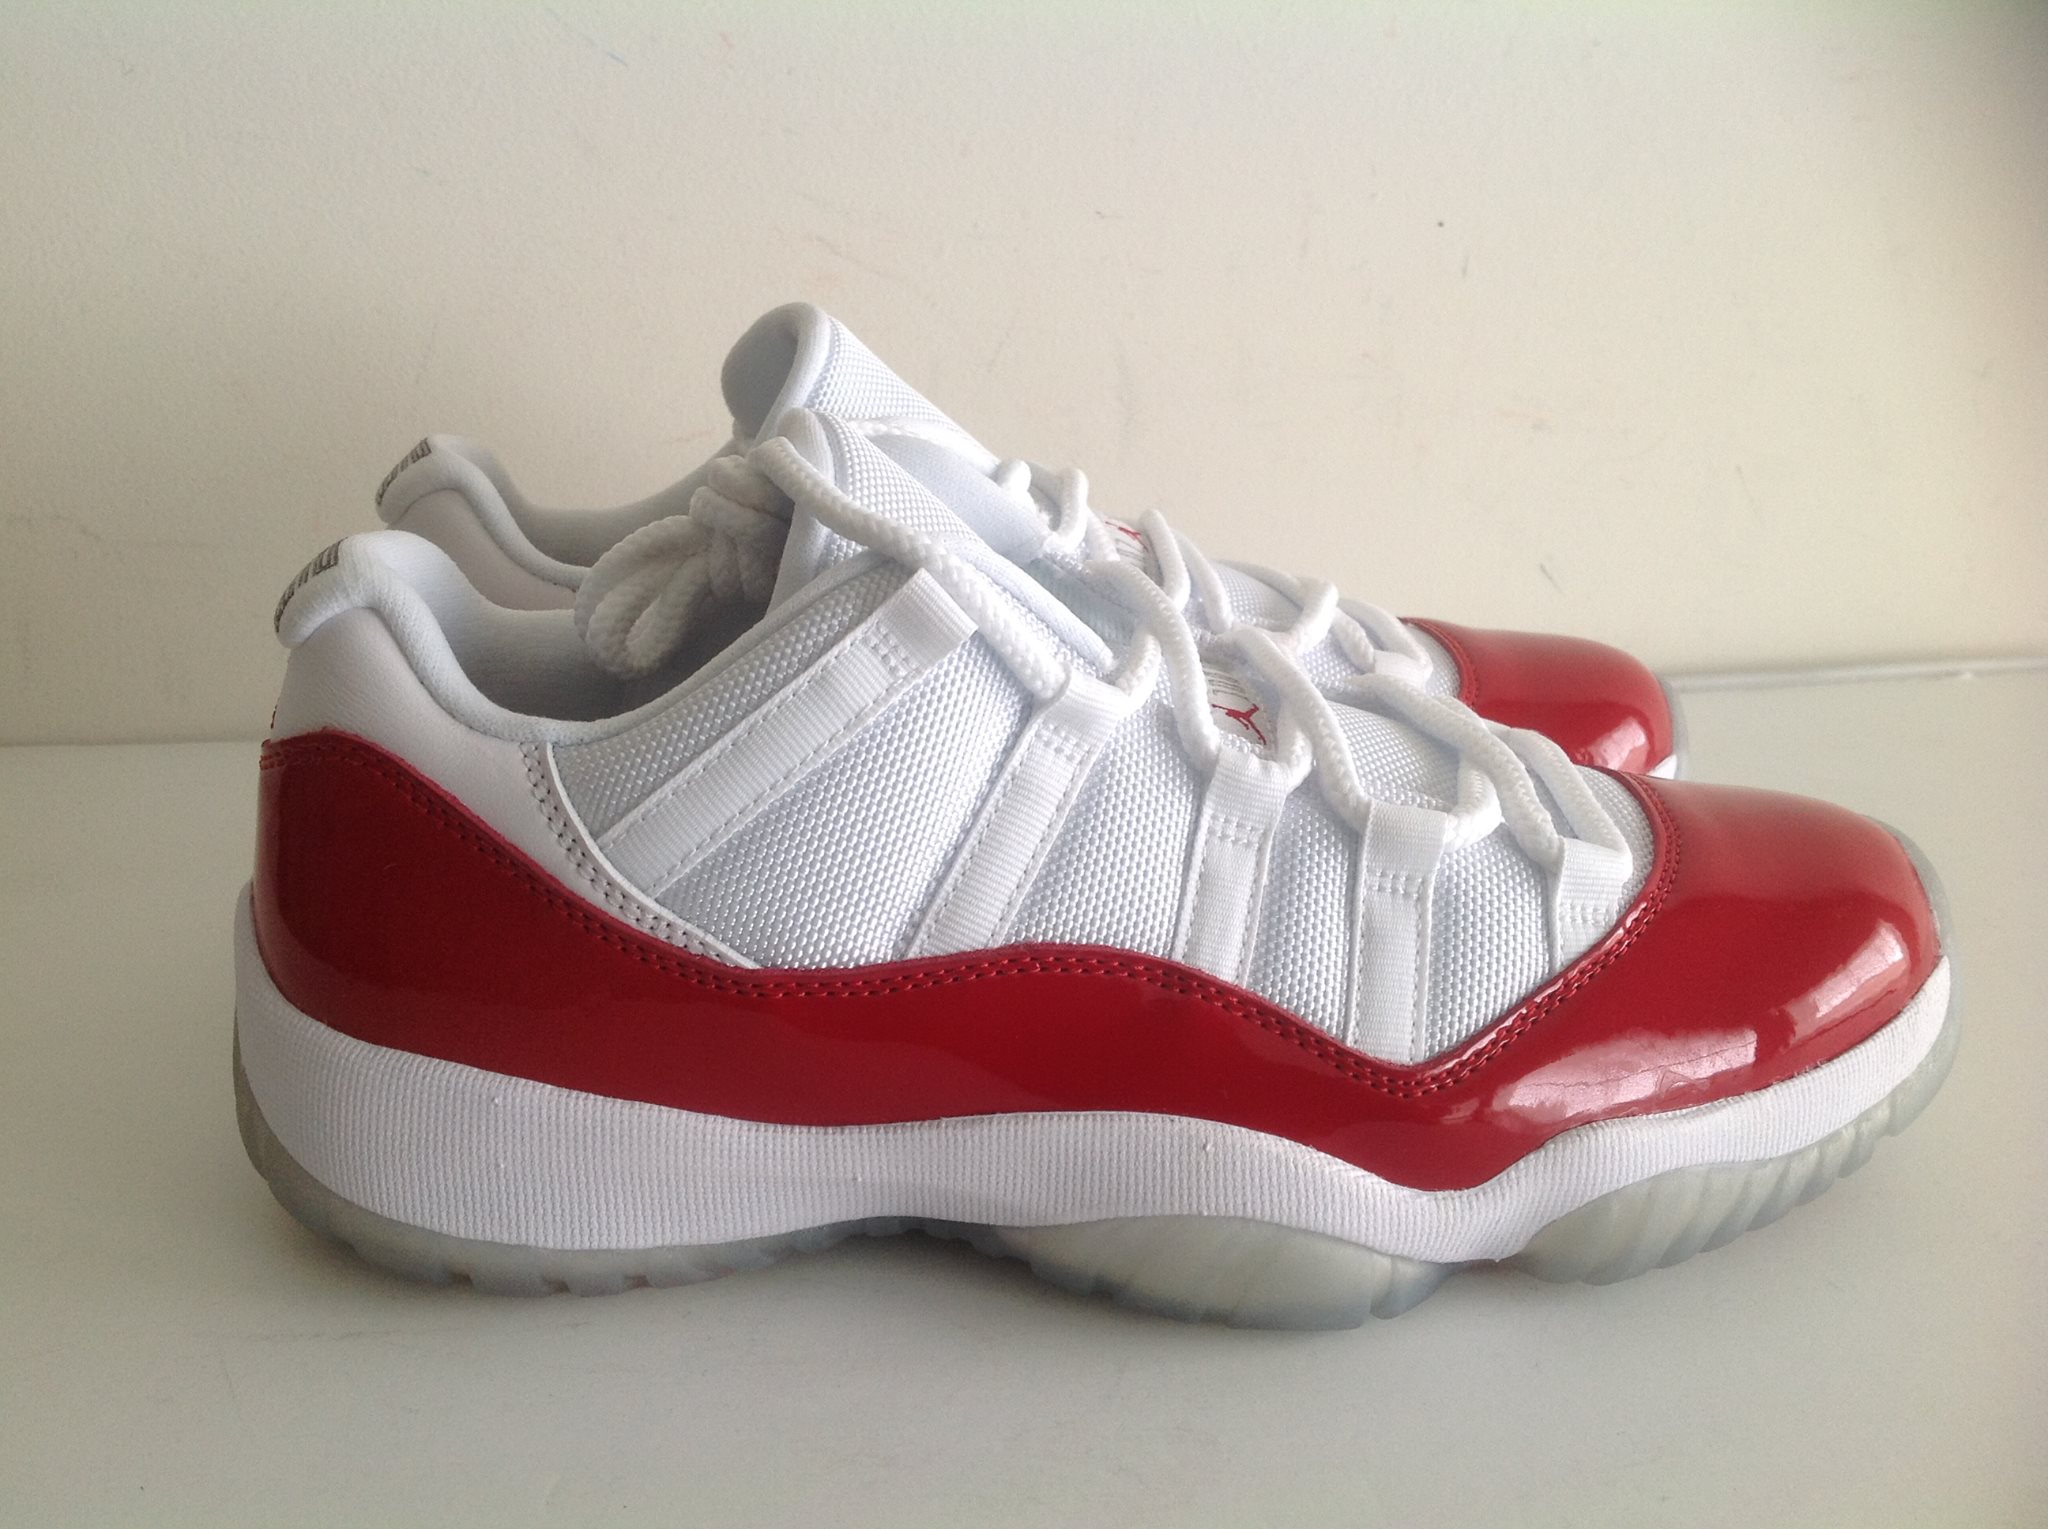 Air jordan 11 retro low cherry white varsity red 528895 102 22900 sciox Images